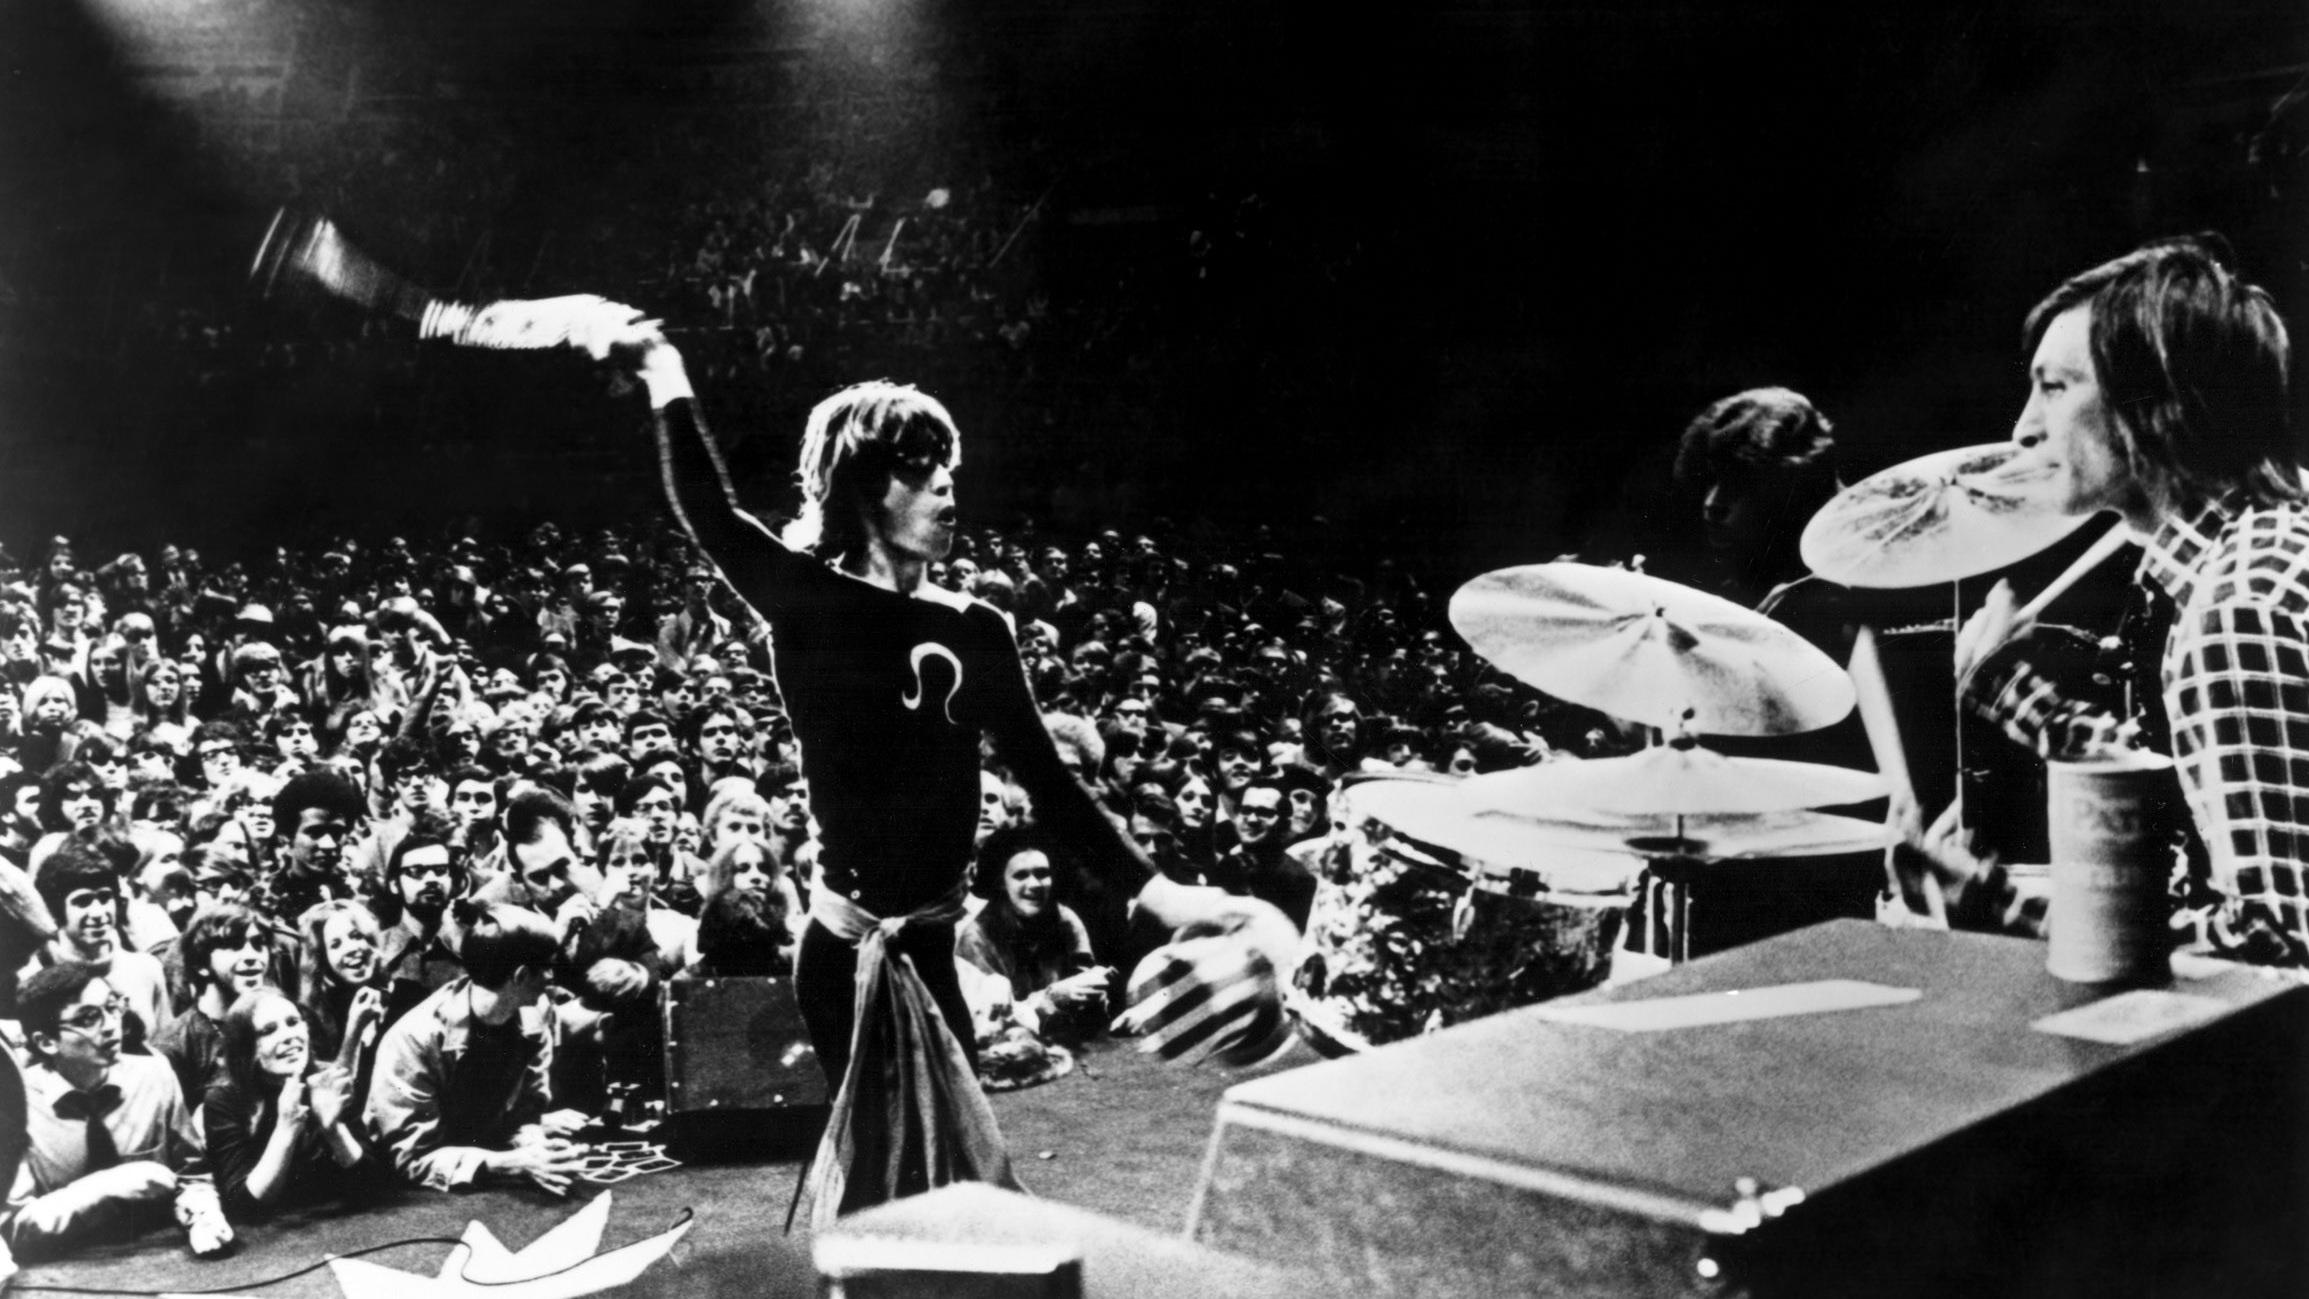 gimme shelter, rolling stones, 1969, altamont, criterion, summer of love, charles manson, 1970